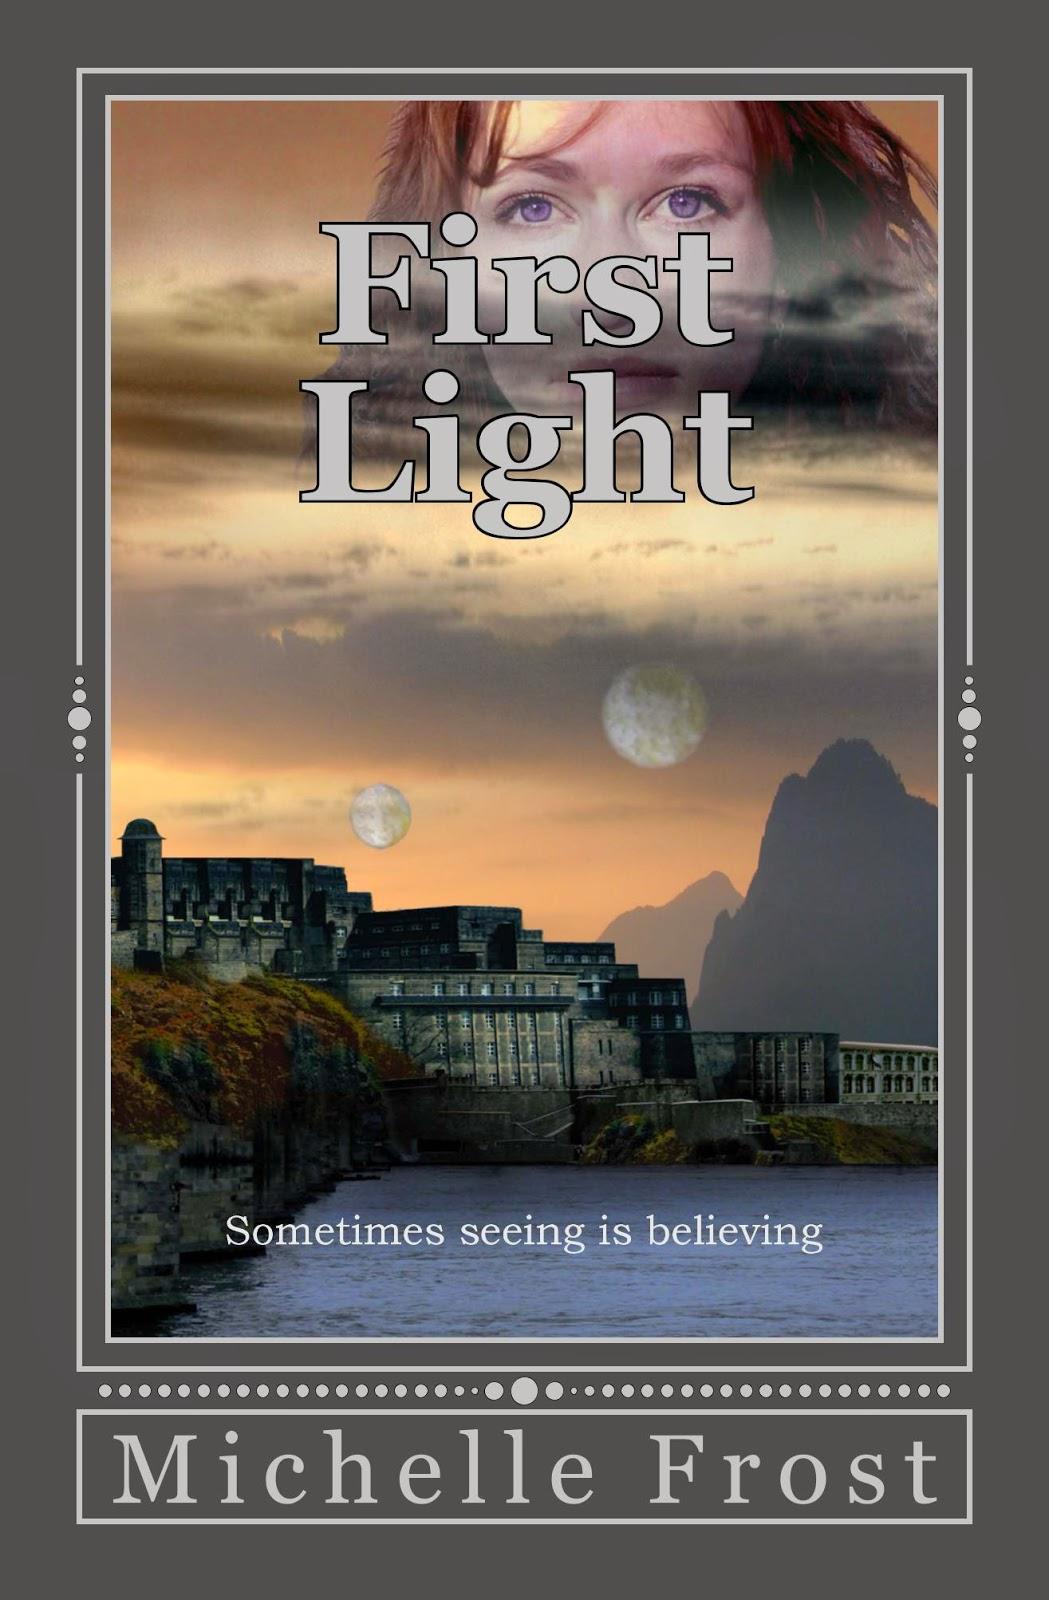 http://firstlightsaga.yolasite.com/book-one.php